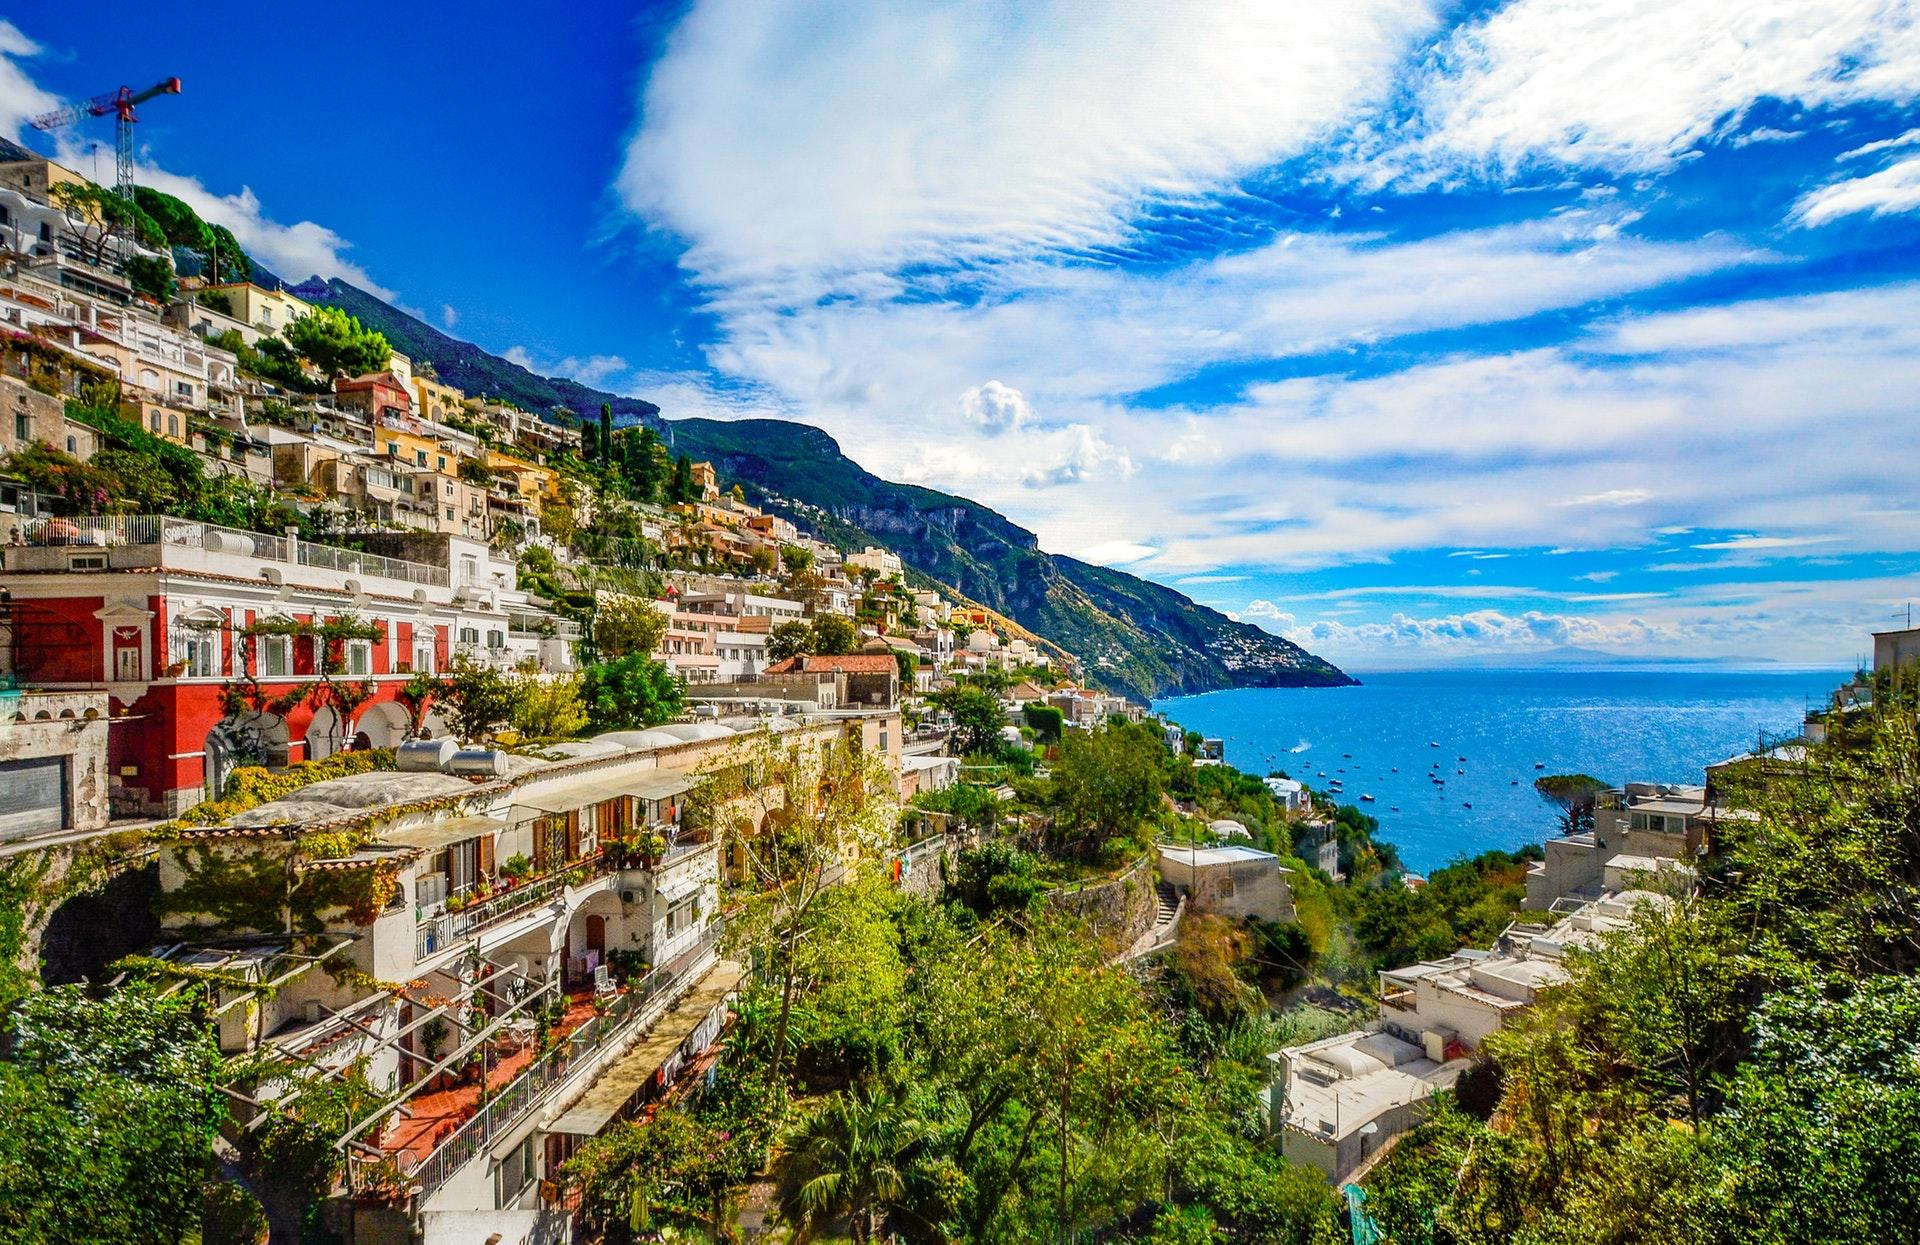 amalfi-amalfi-coast-architecture-373575